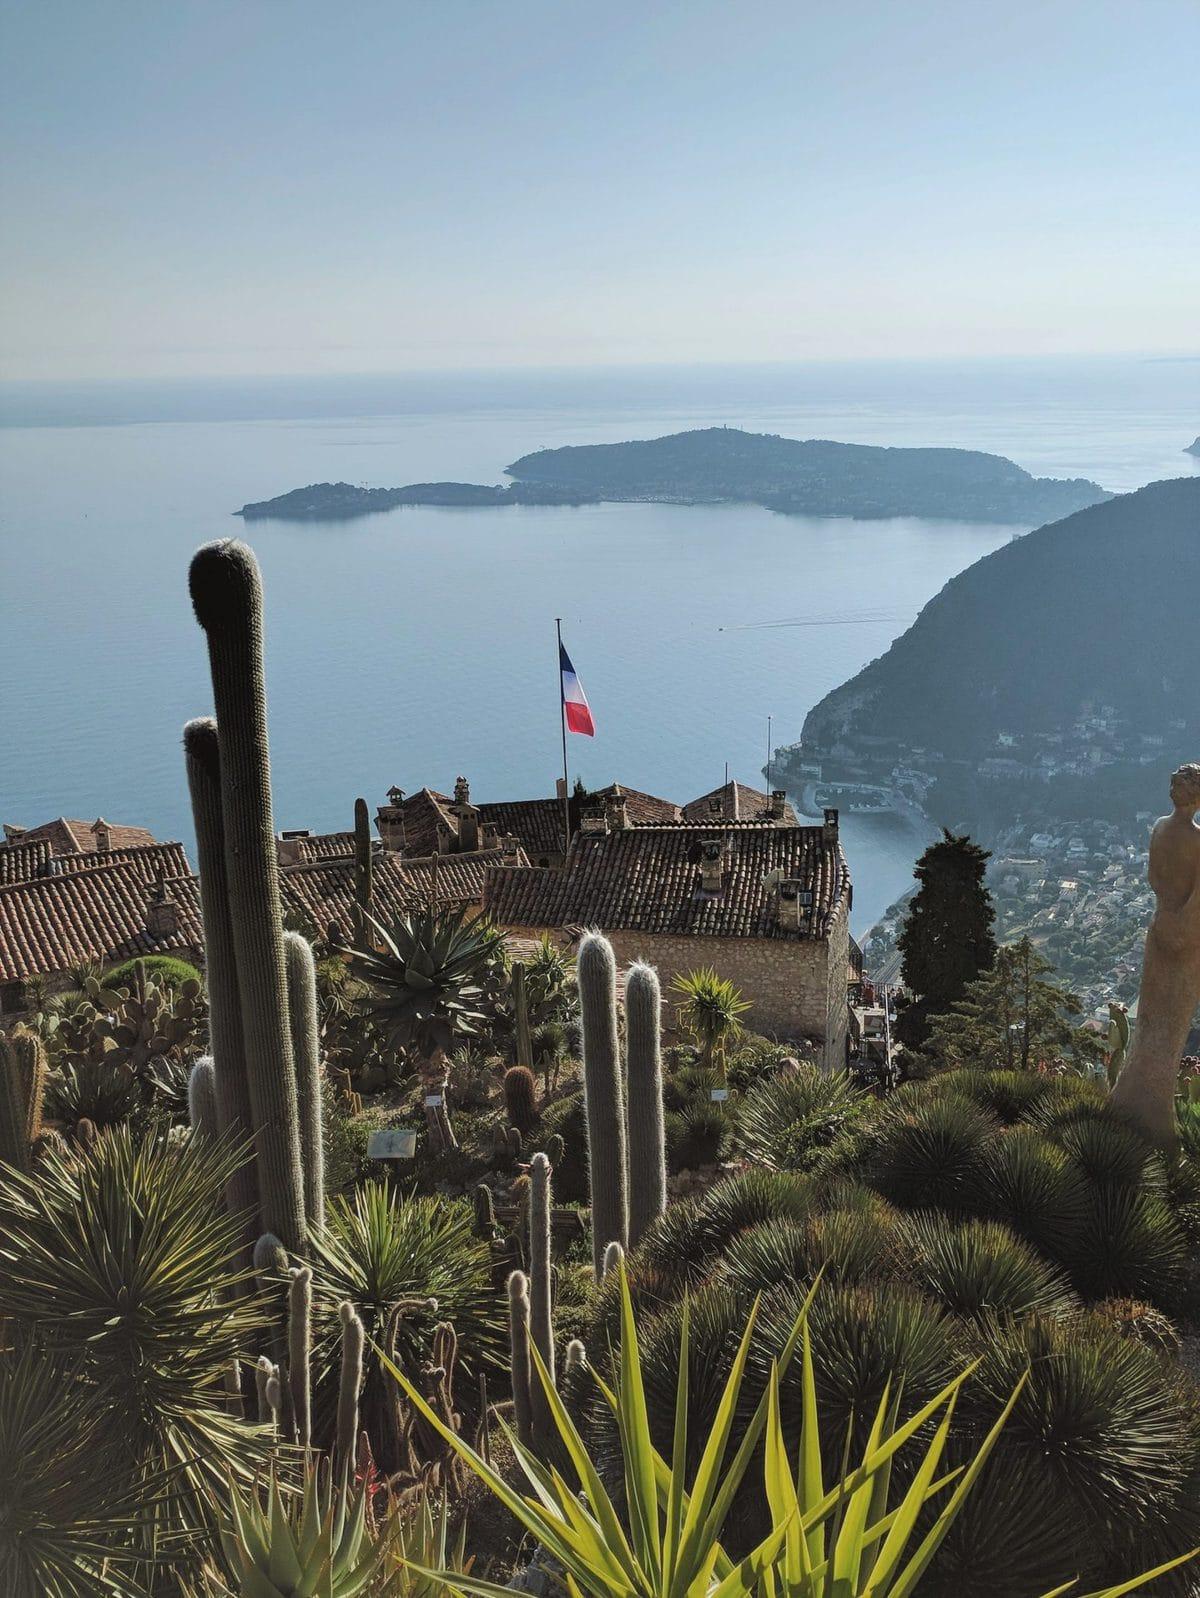 Botanical garden at the top of Eze Village overlooking the ocean